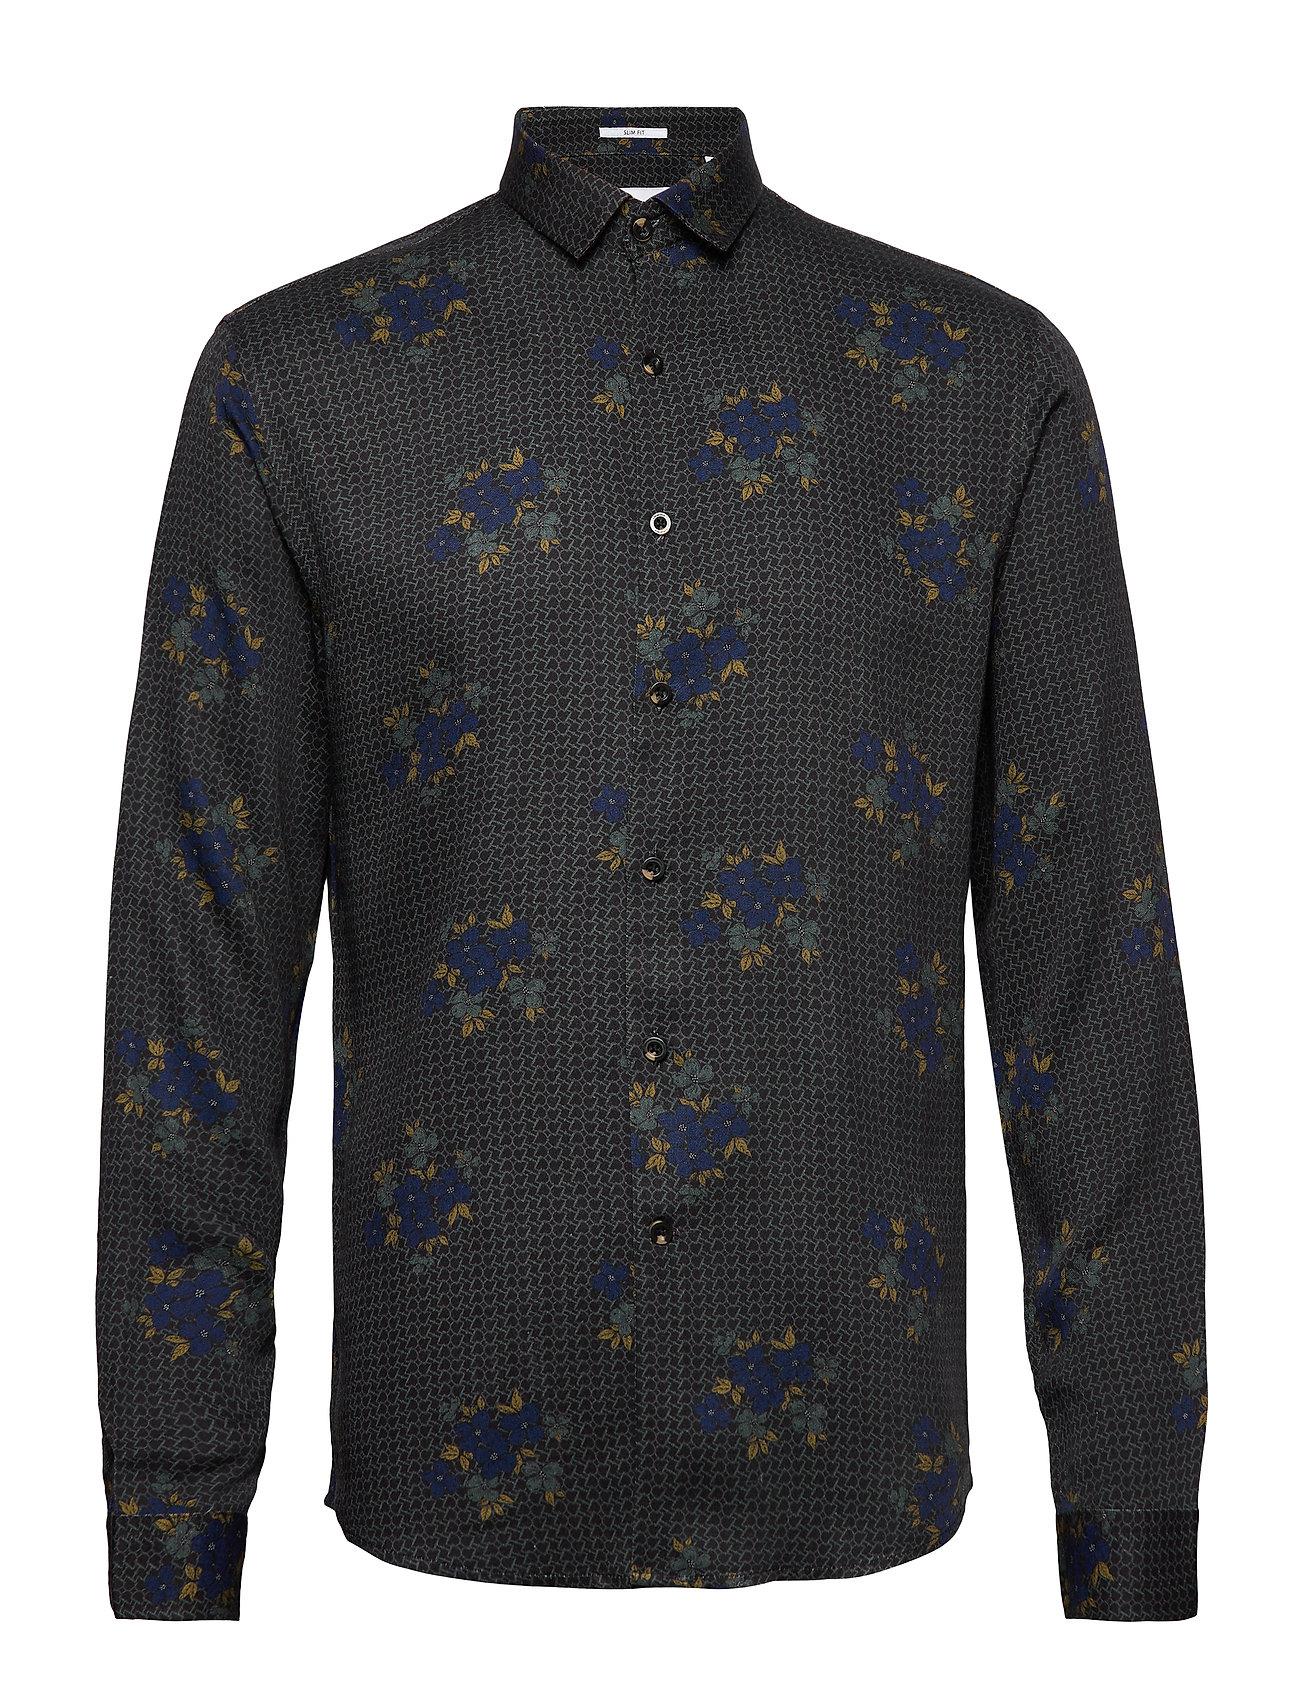 Lindbergh Floral viscose print shirt L/S - BROWN